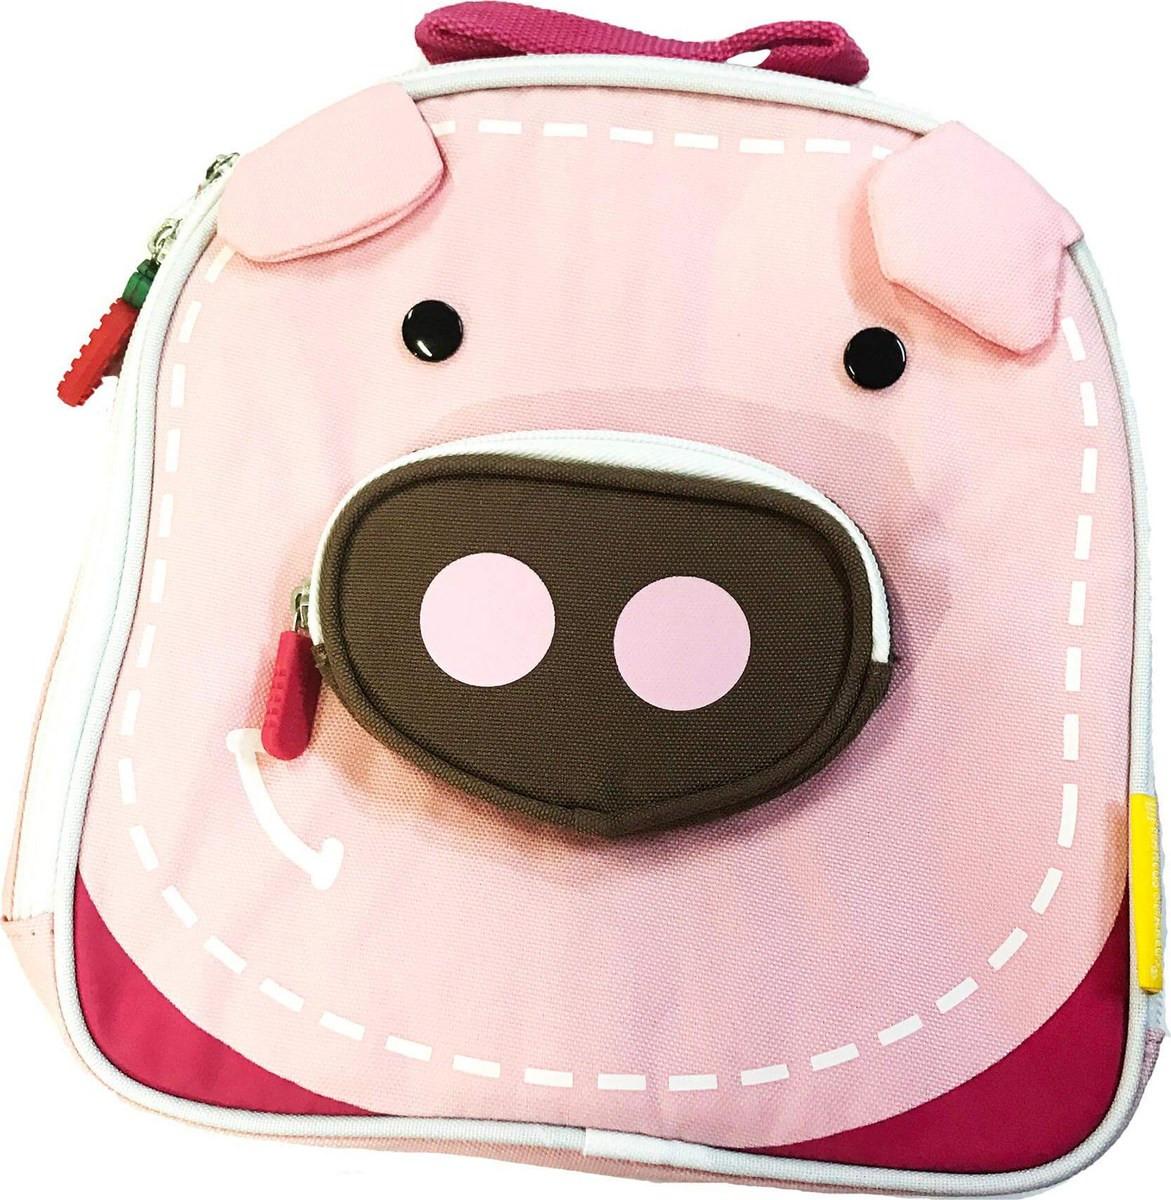 622c3b2950 bag ροζ - Σχολικές Τσάντες